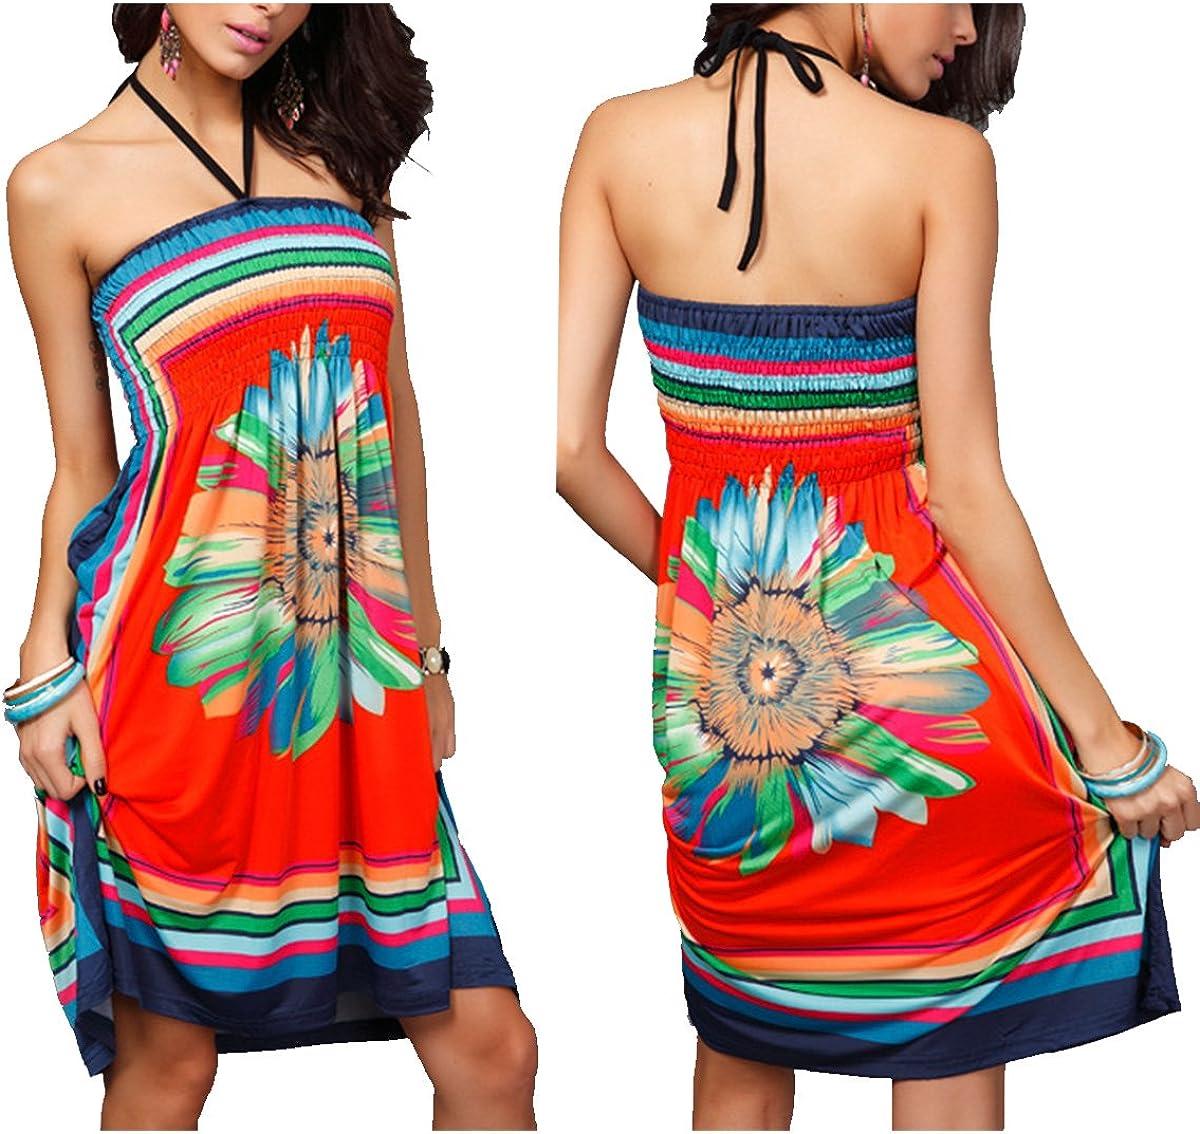 oboss Women Strapless Ethnic Boho Bandeau Beach Sun Dress Loose Bathing Suit Swimsuit Cover Up